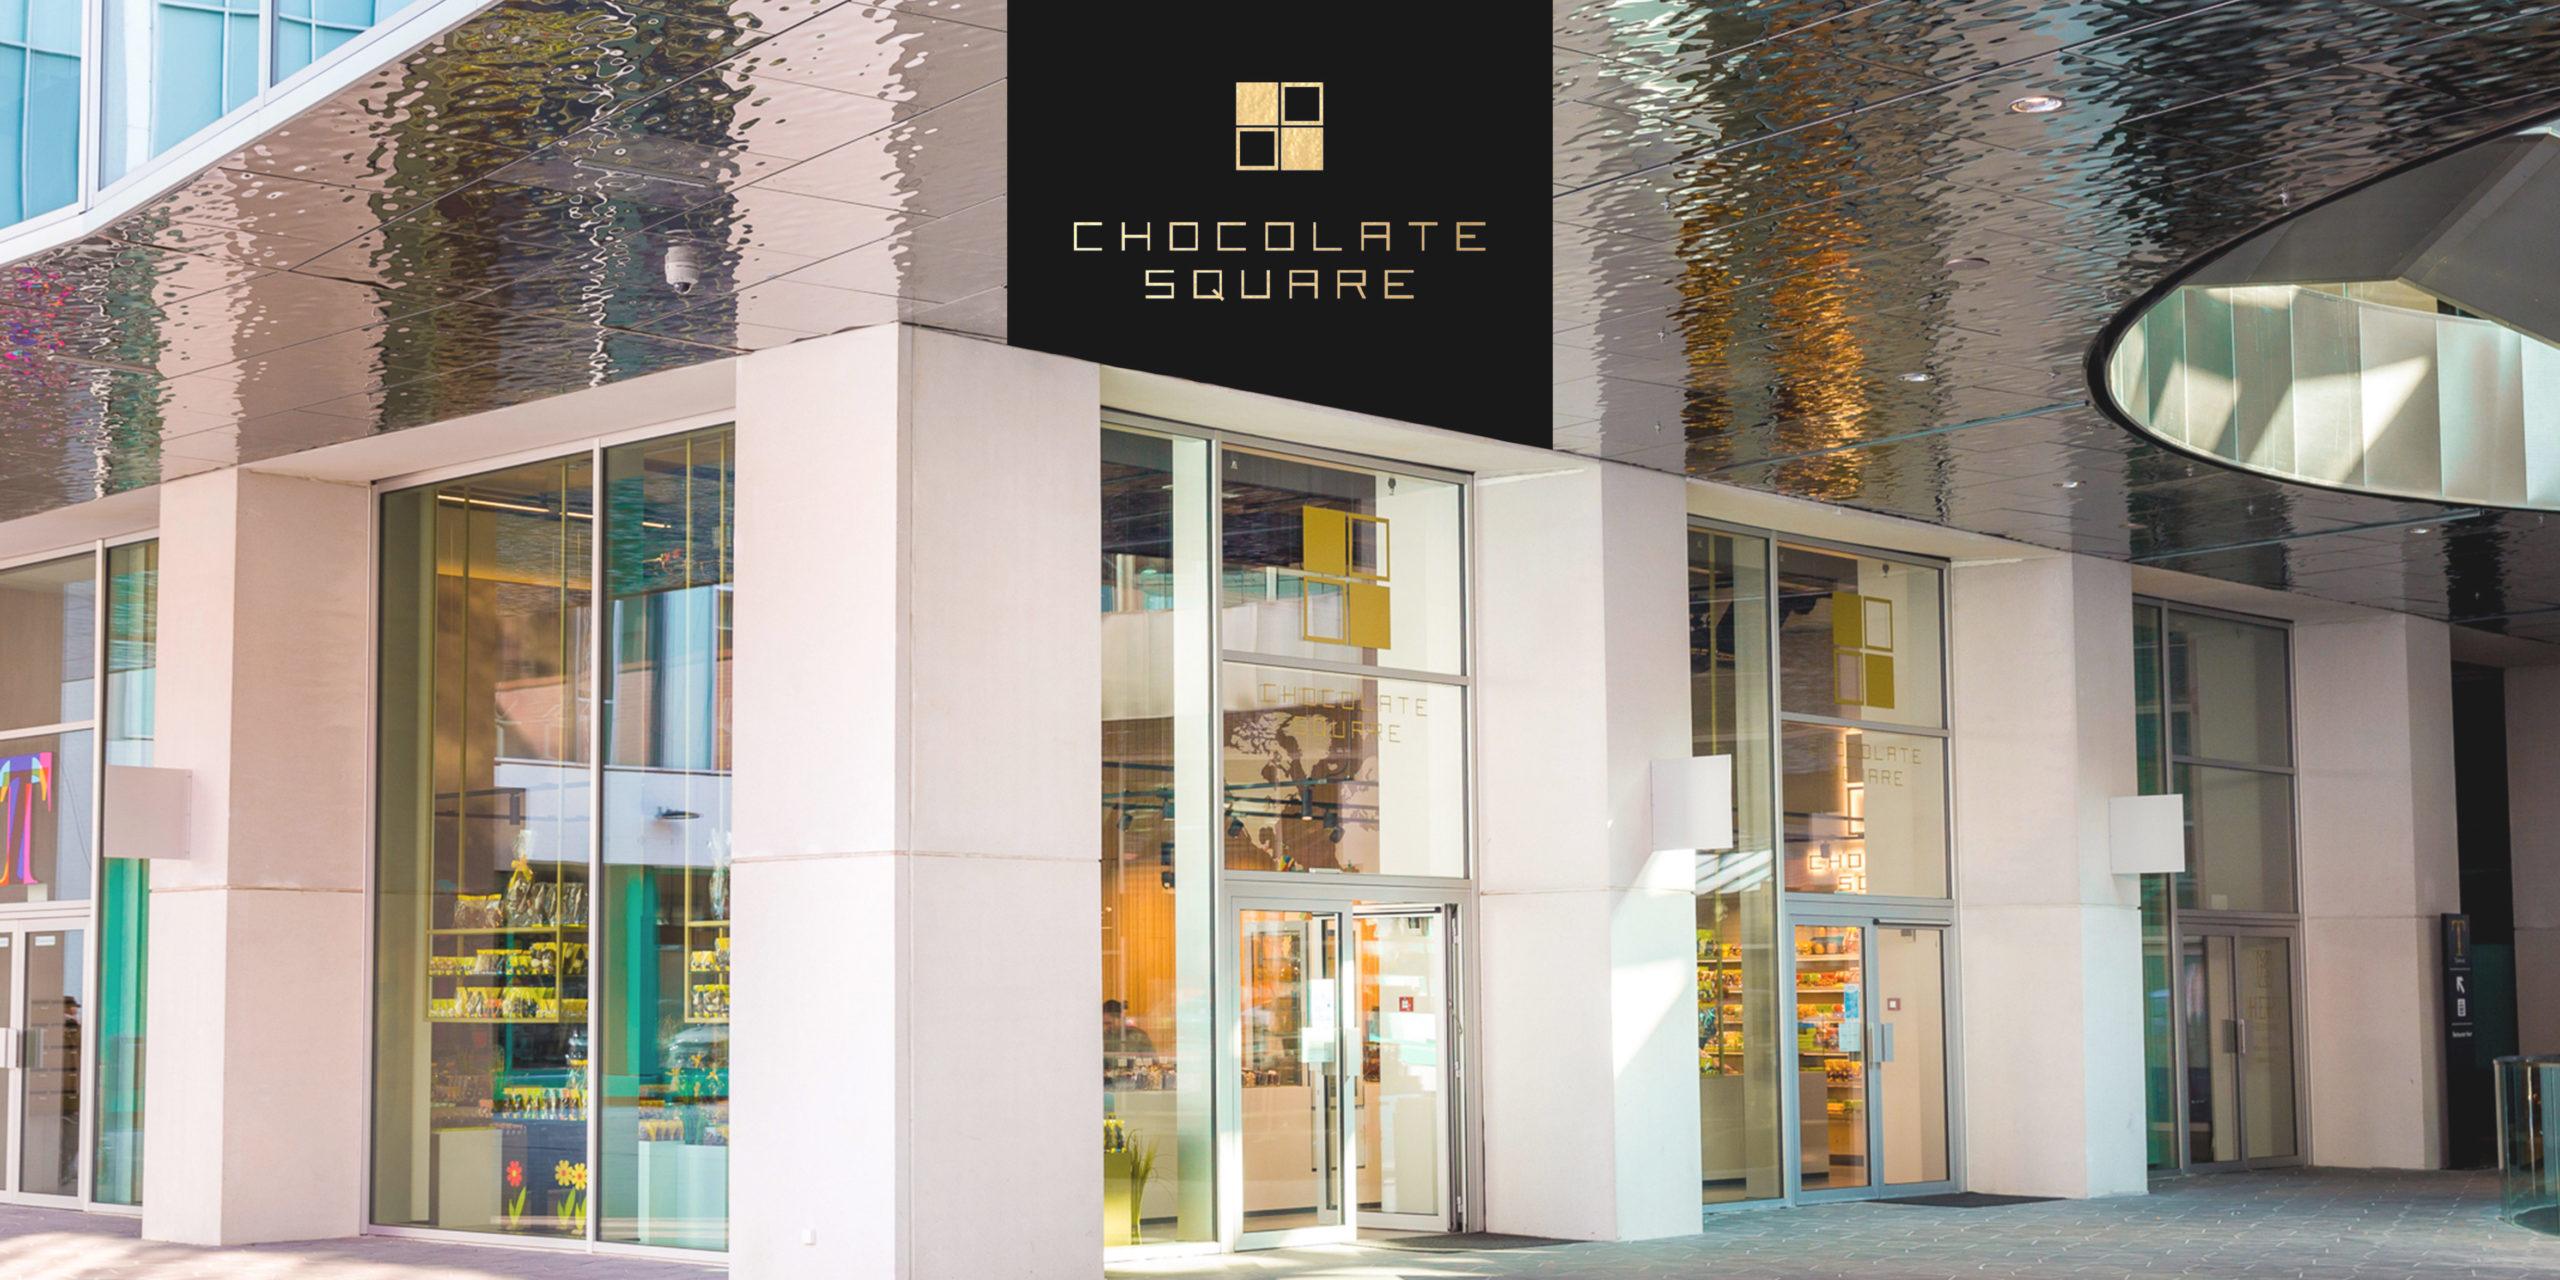 10-ChocolateSquare-01